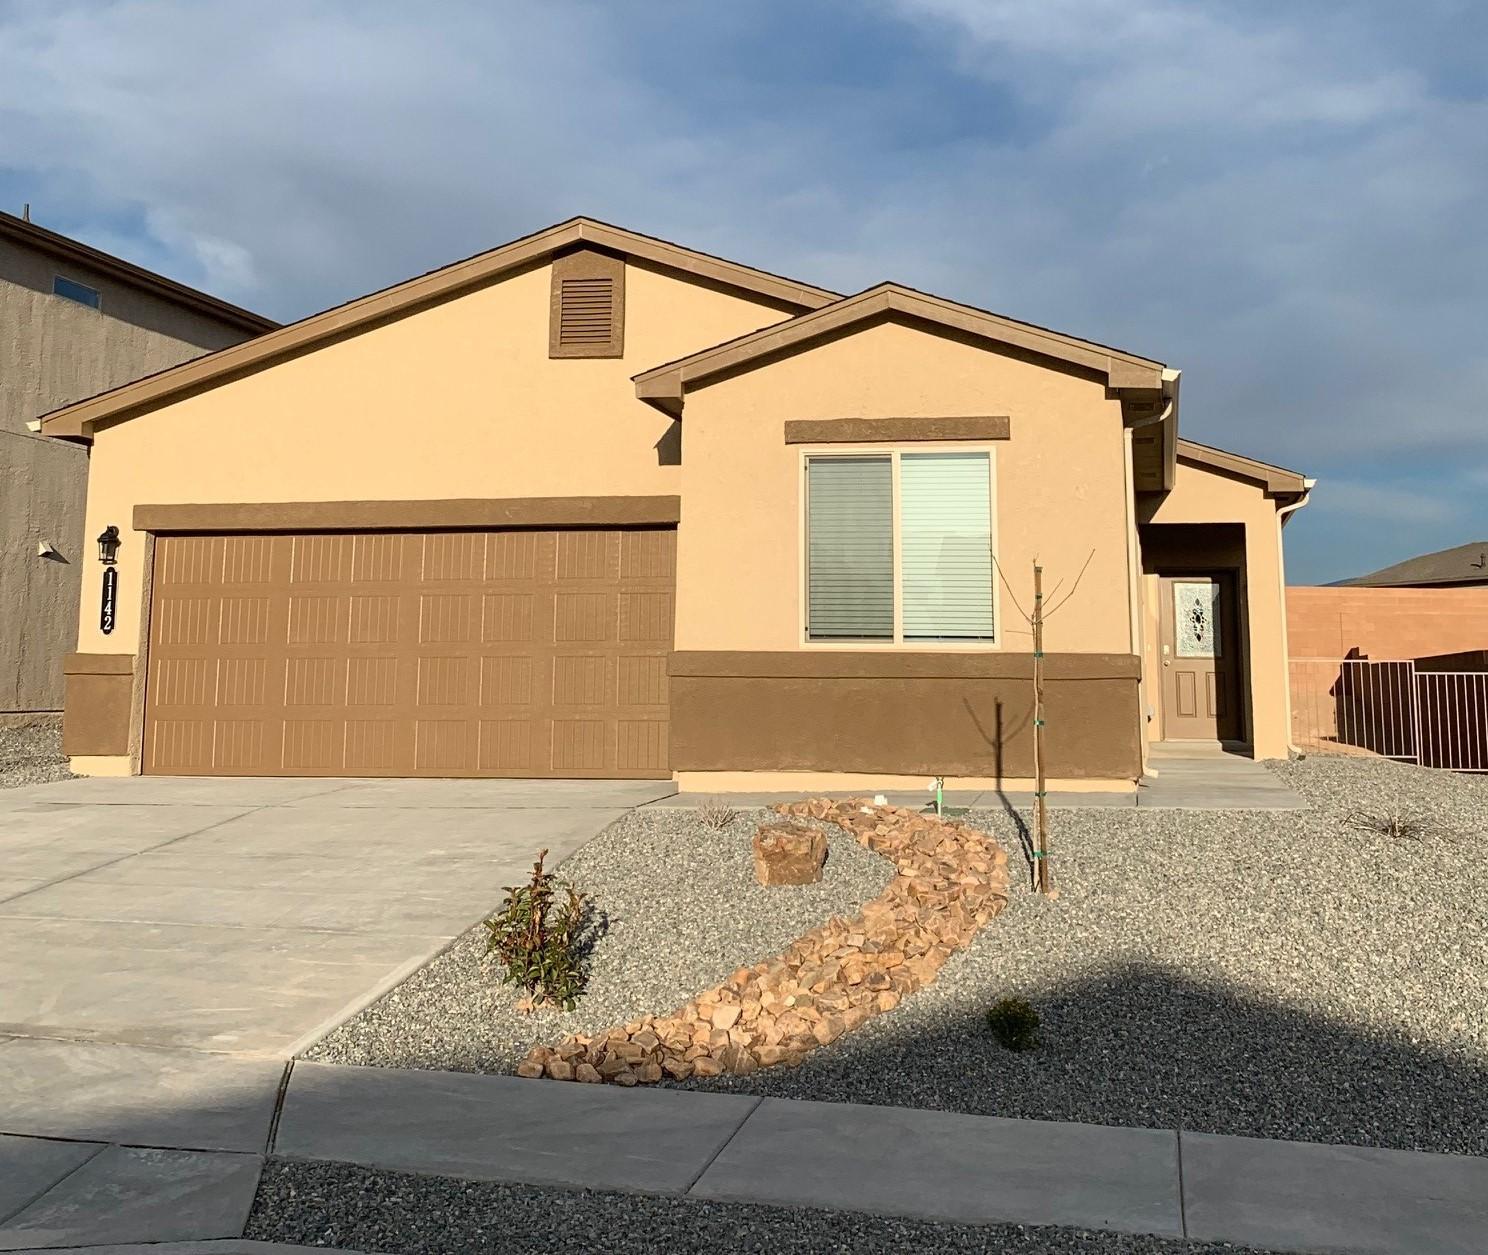 1142 NE Grace Street, Rio Rancho in Sandoval County, NM 87144 Home for Sale